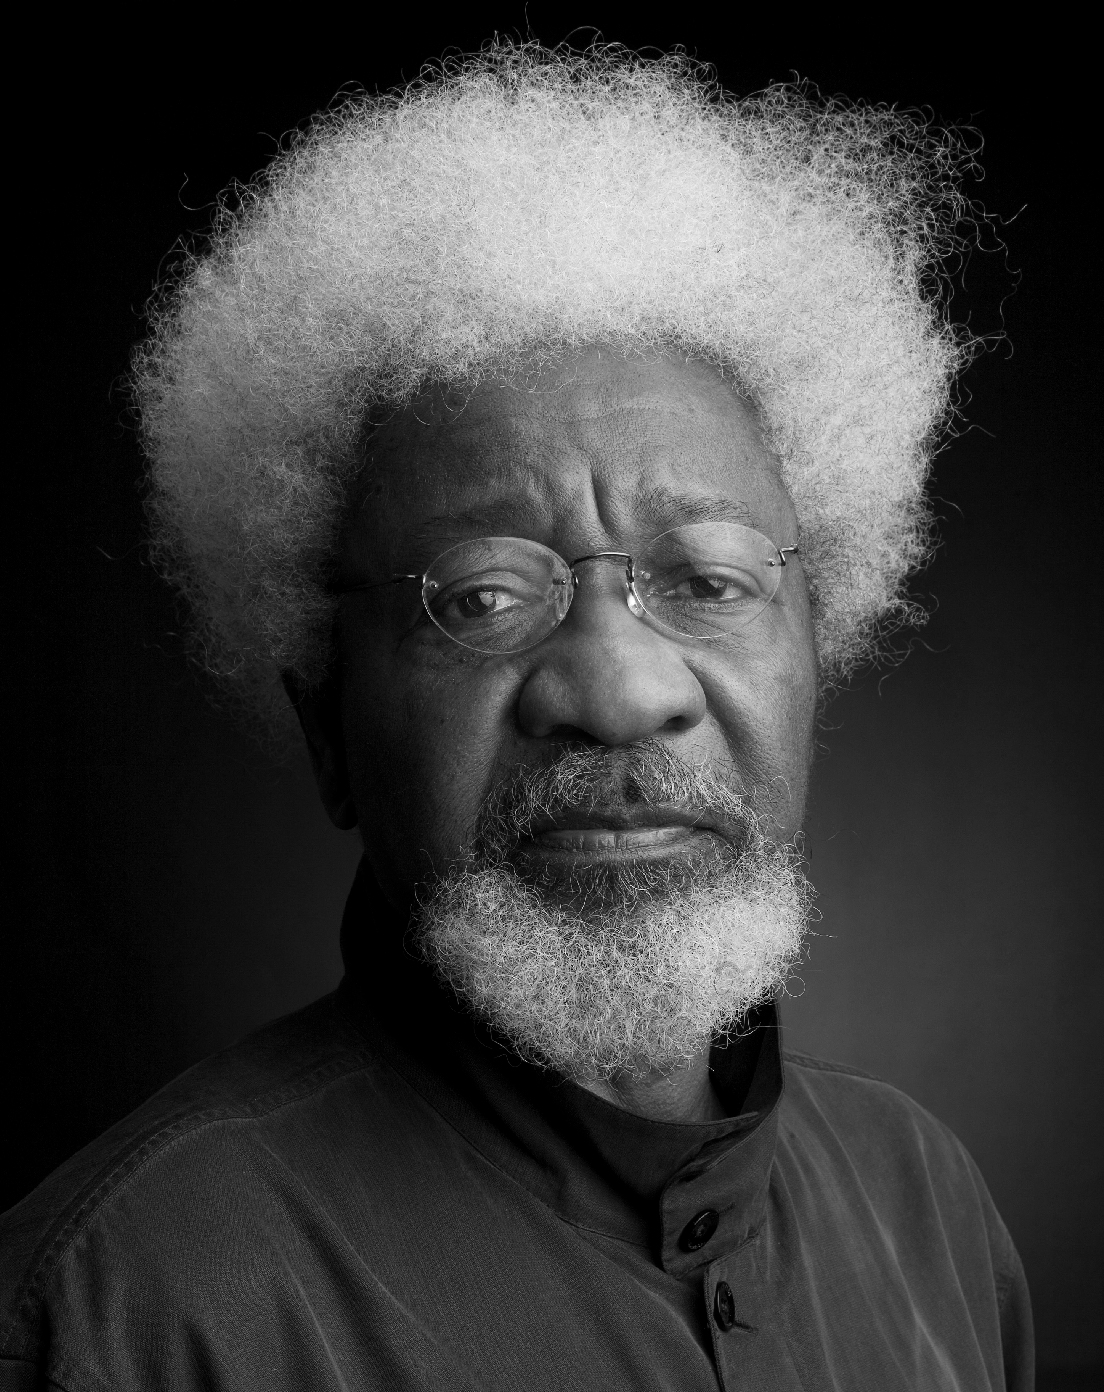 Portrait of Wole Soyinka